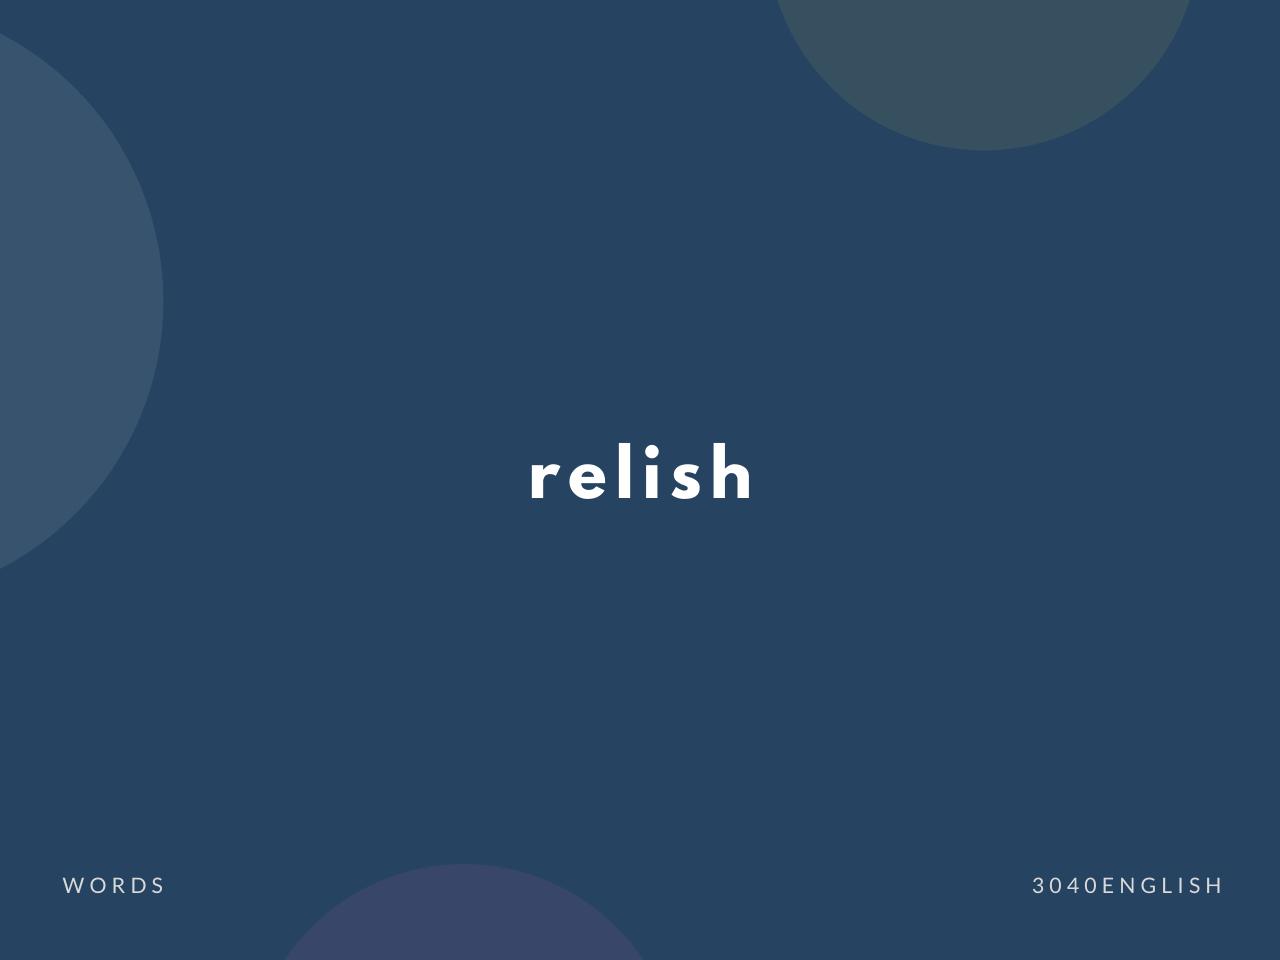 relish の意味と簡単な使い方【音読用例文あり】